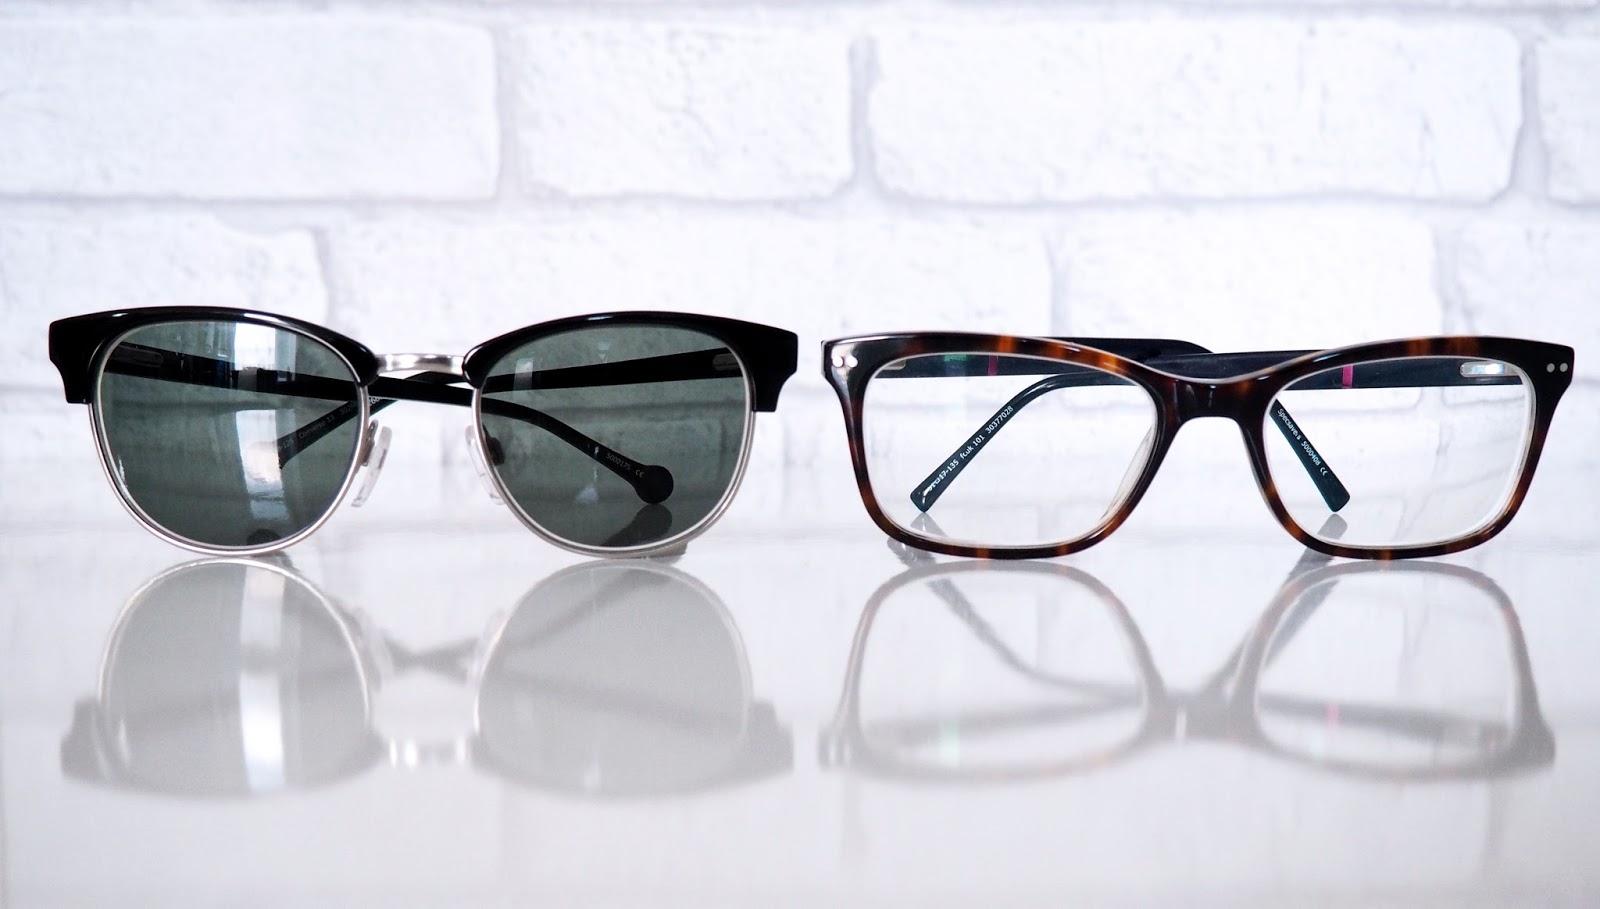 Reinventing Specsavers Reinventing Specsavers Neesha Specsavers Glasses Glasses Neesha Glasses XZOikuPT